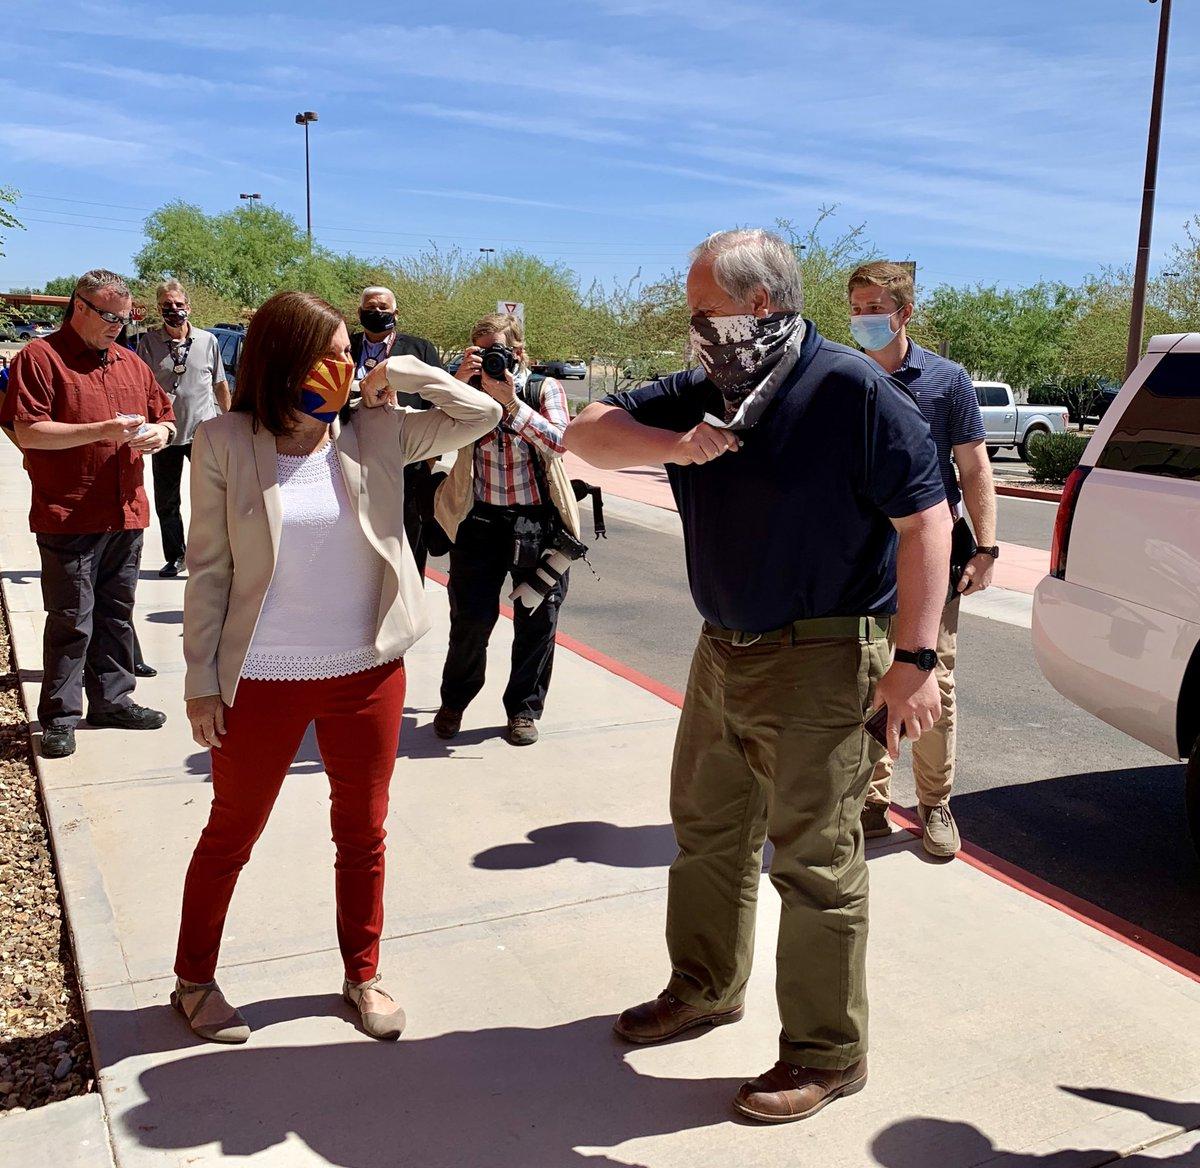 Welcome to Arizona, @SecBernhardt!